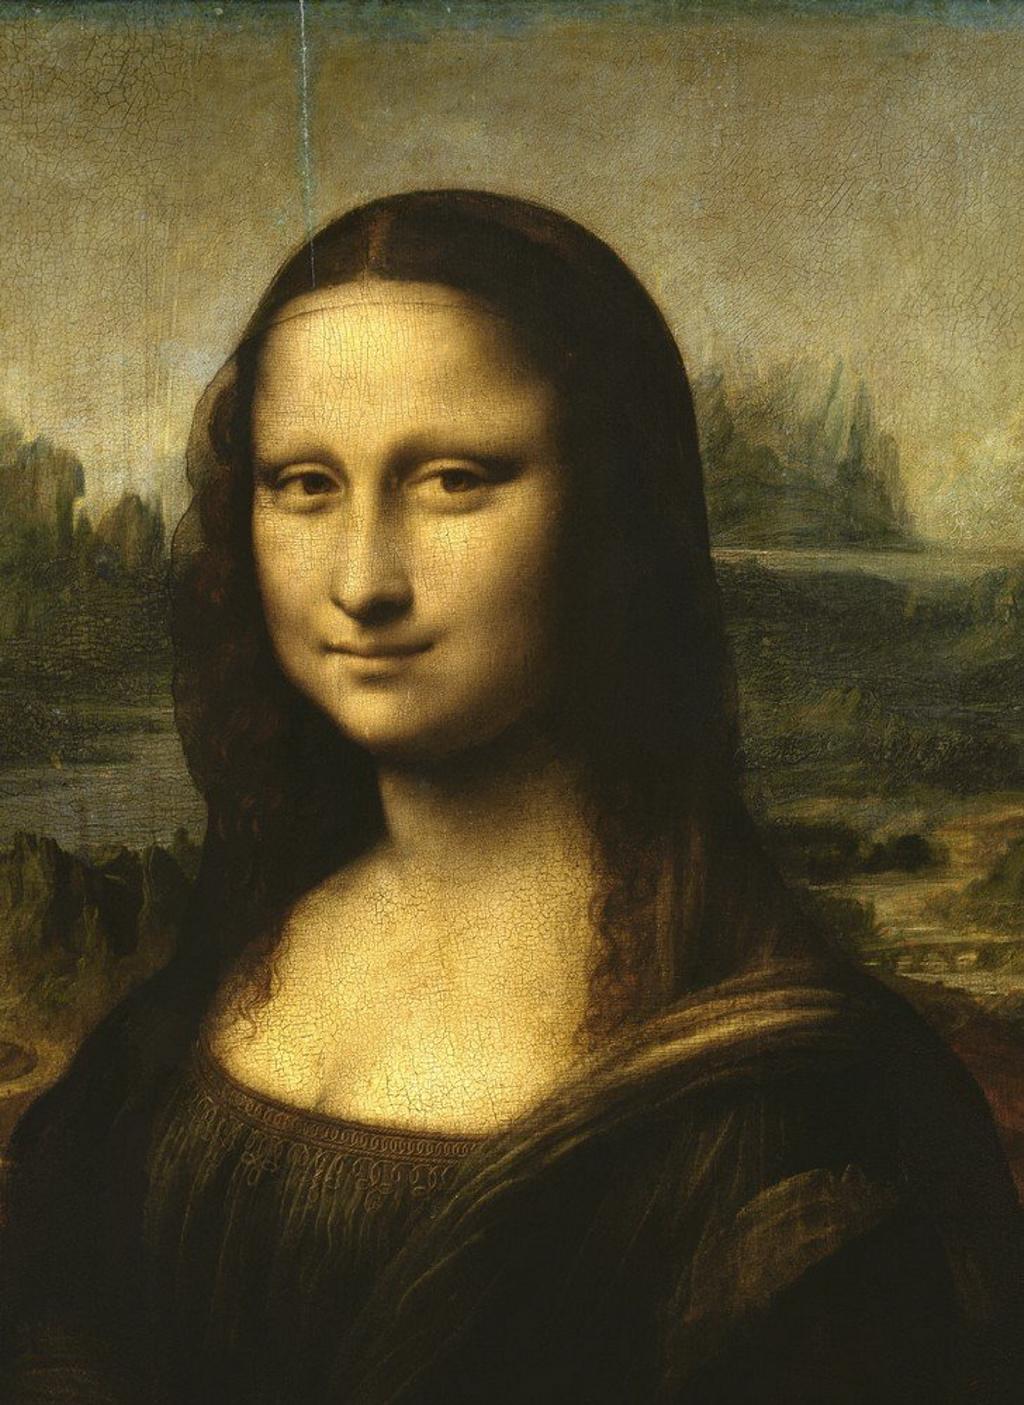 La Mona Lisa realmente está sonriendo